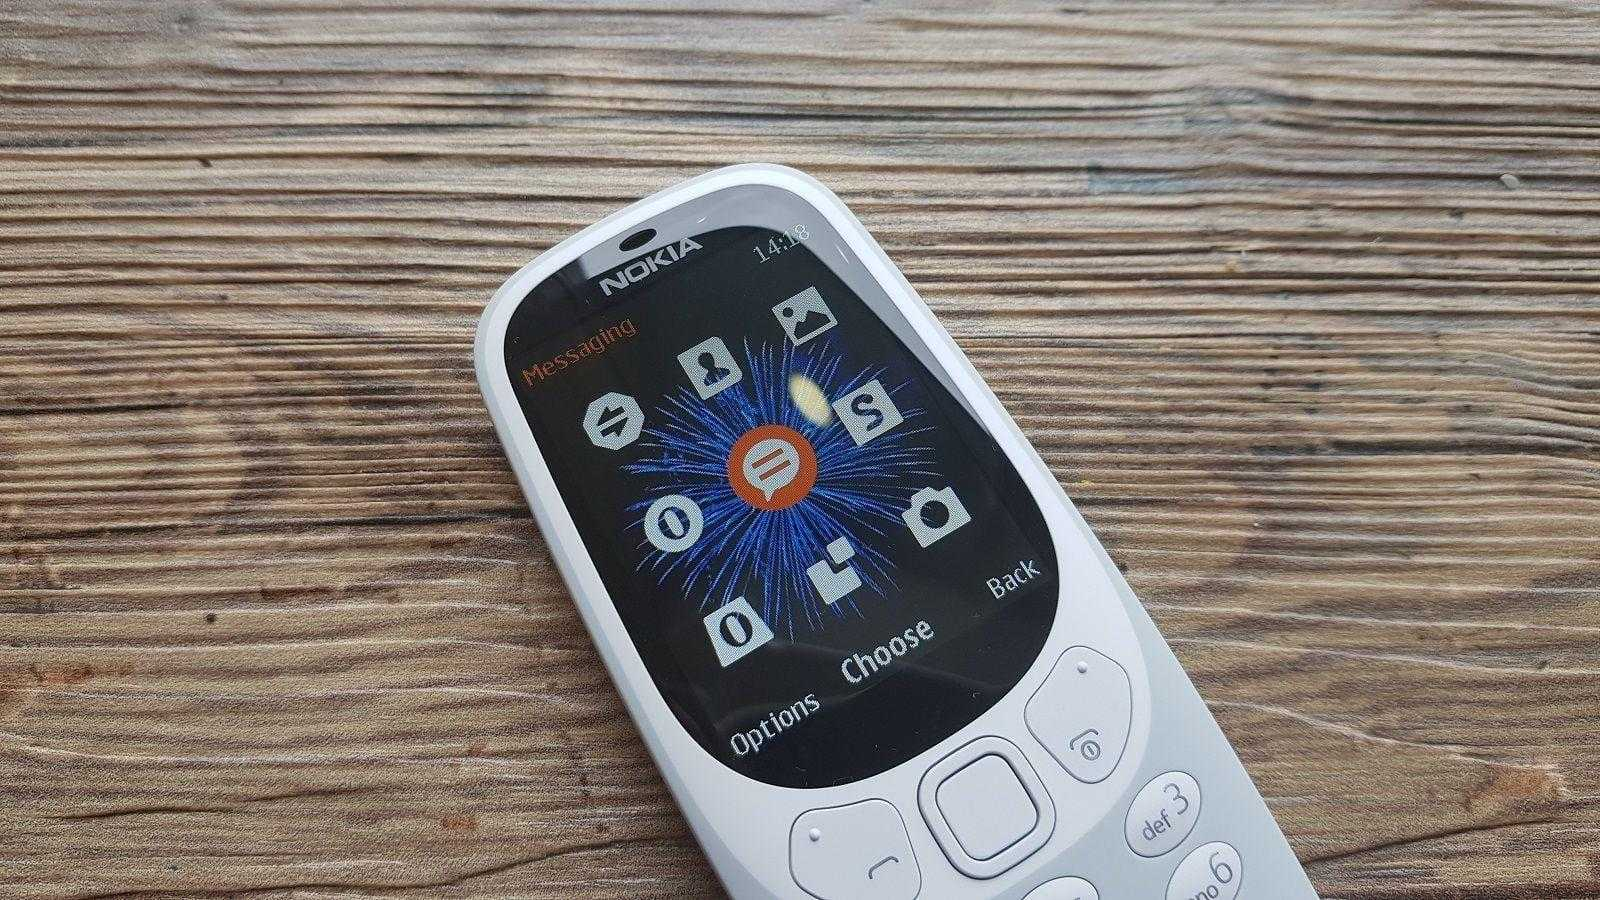 Nokia 3310 получит 3G (nokia 3310 user interface)